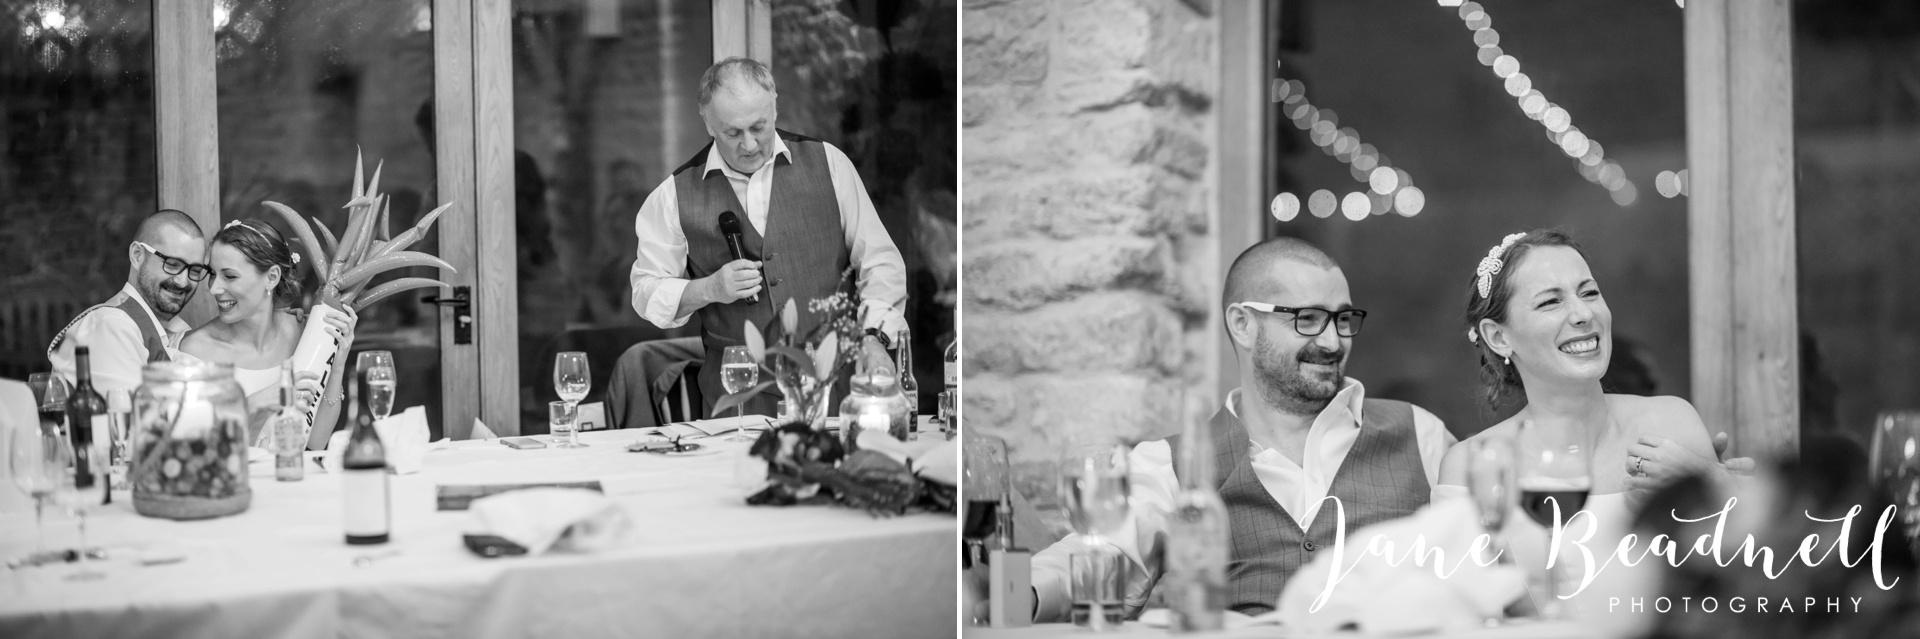 The Kingcote Barn Bristol Yorkshire and destination wedding photographer Jane Beadnell Photography_0082